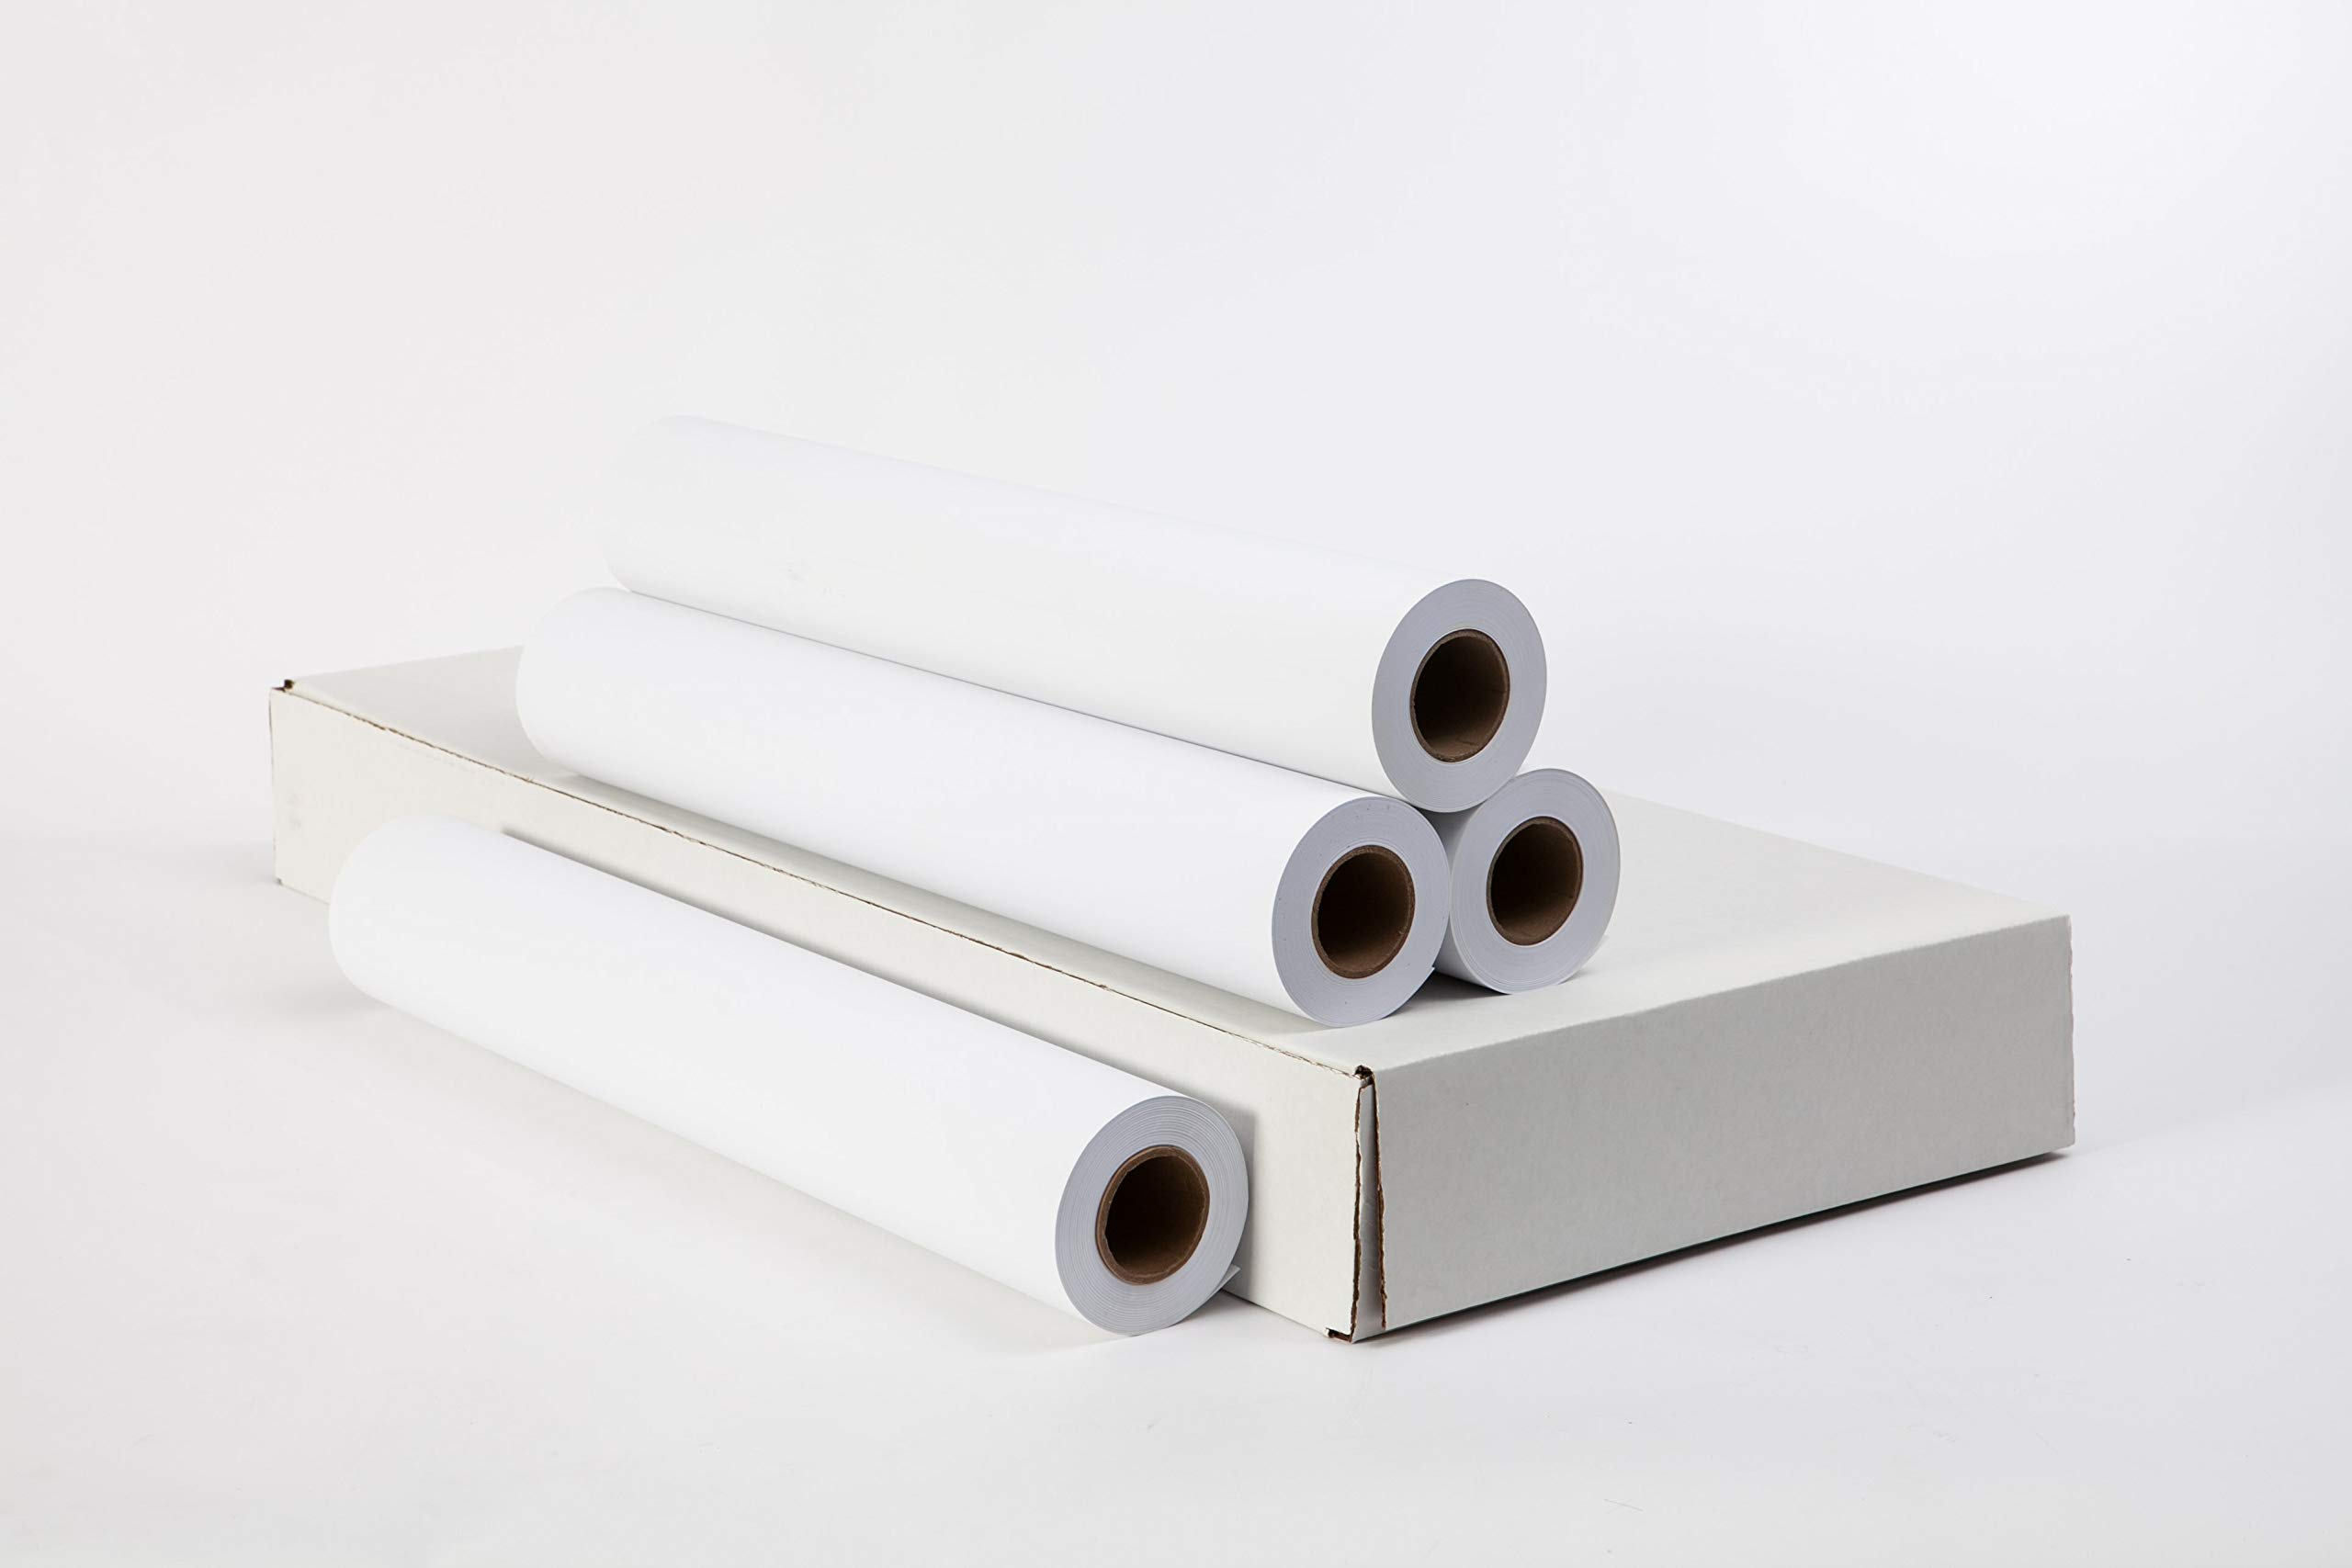 20# CAD Bond Inkjet Plotting Paper - 92 Bright - 20BIJ - 34'' x 150' (4 roll carton - 2 inch core)